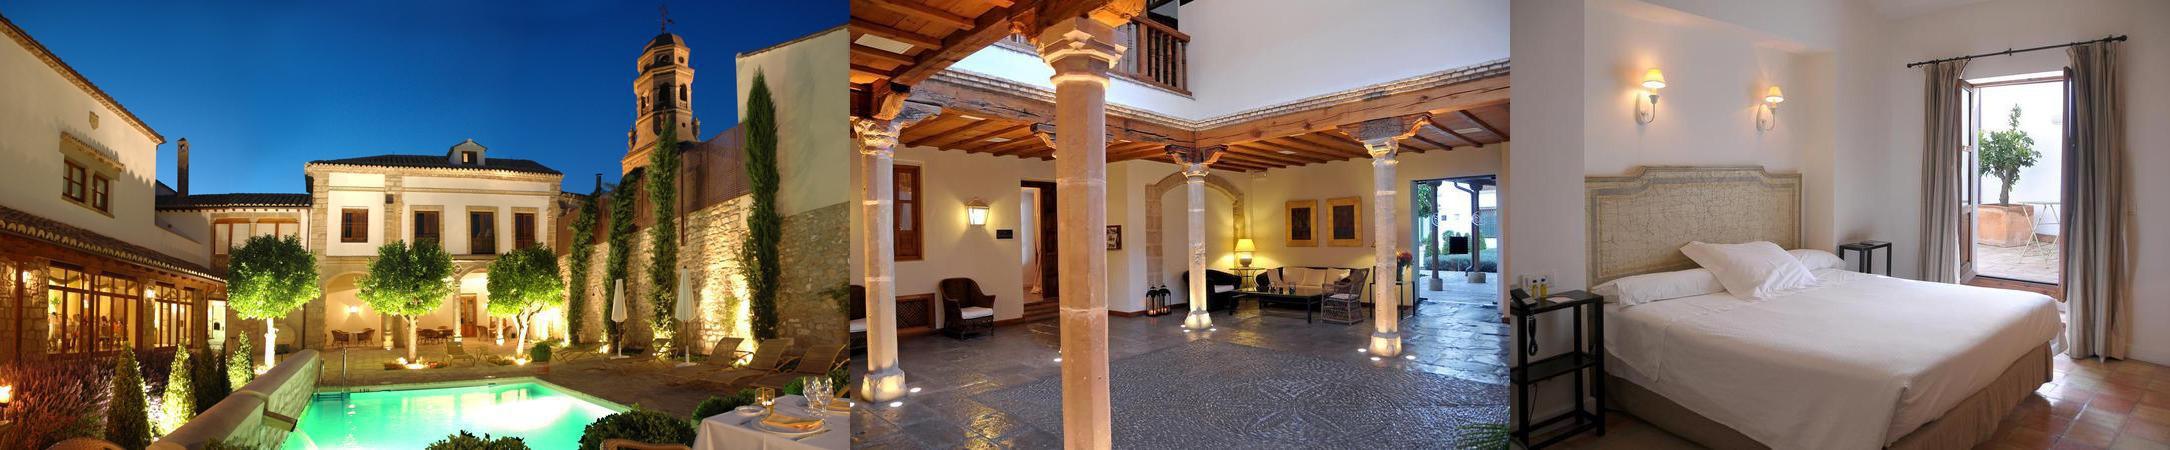 Hotel puerta de la luna andalusiaguide - Hotel puerta de la luna baeza ...